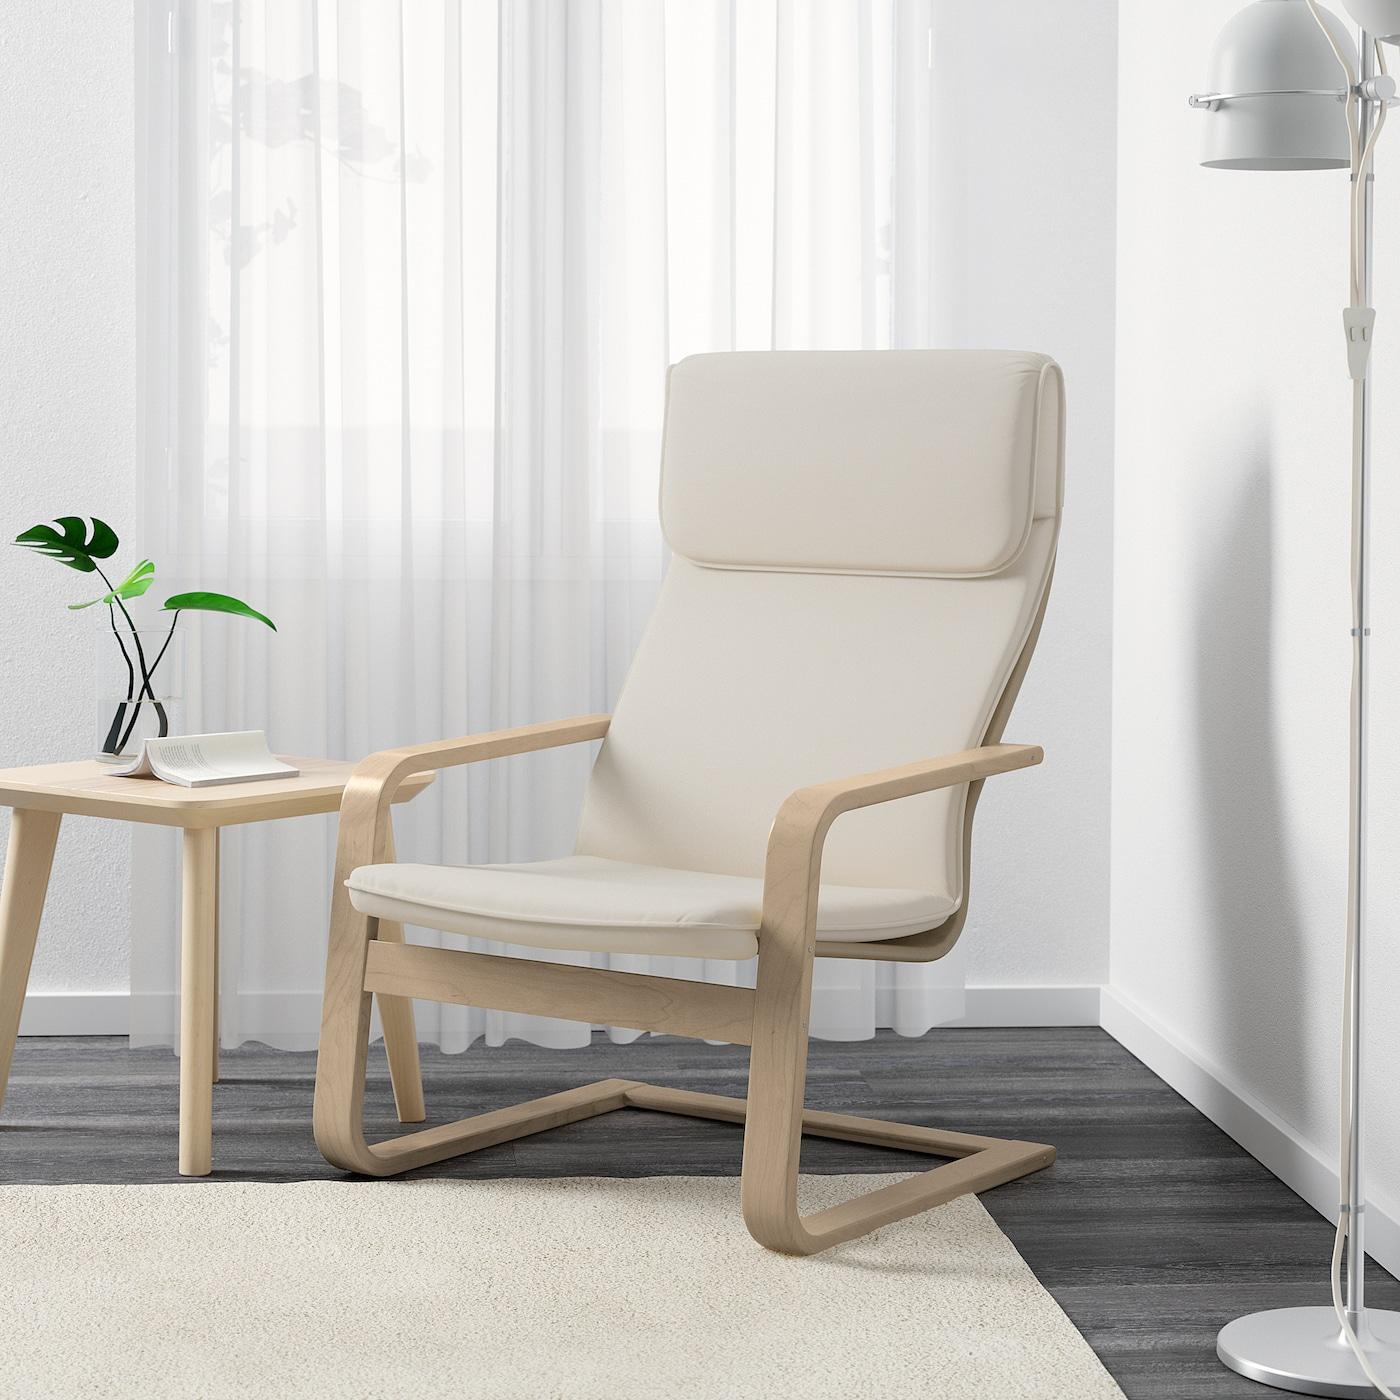 PELLO Fauteuil, Holmby naturel IKEA